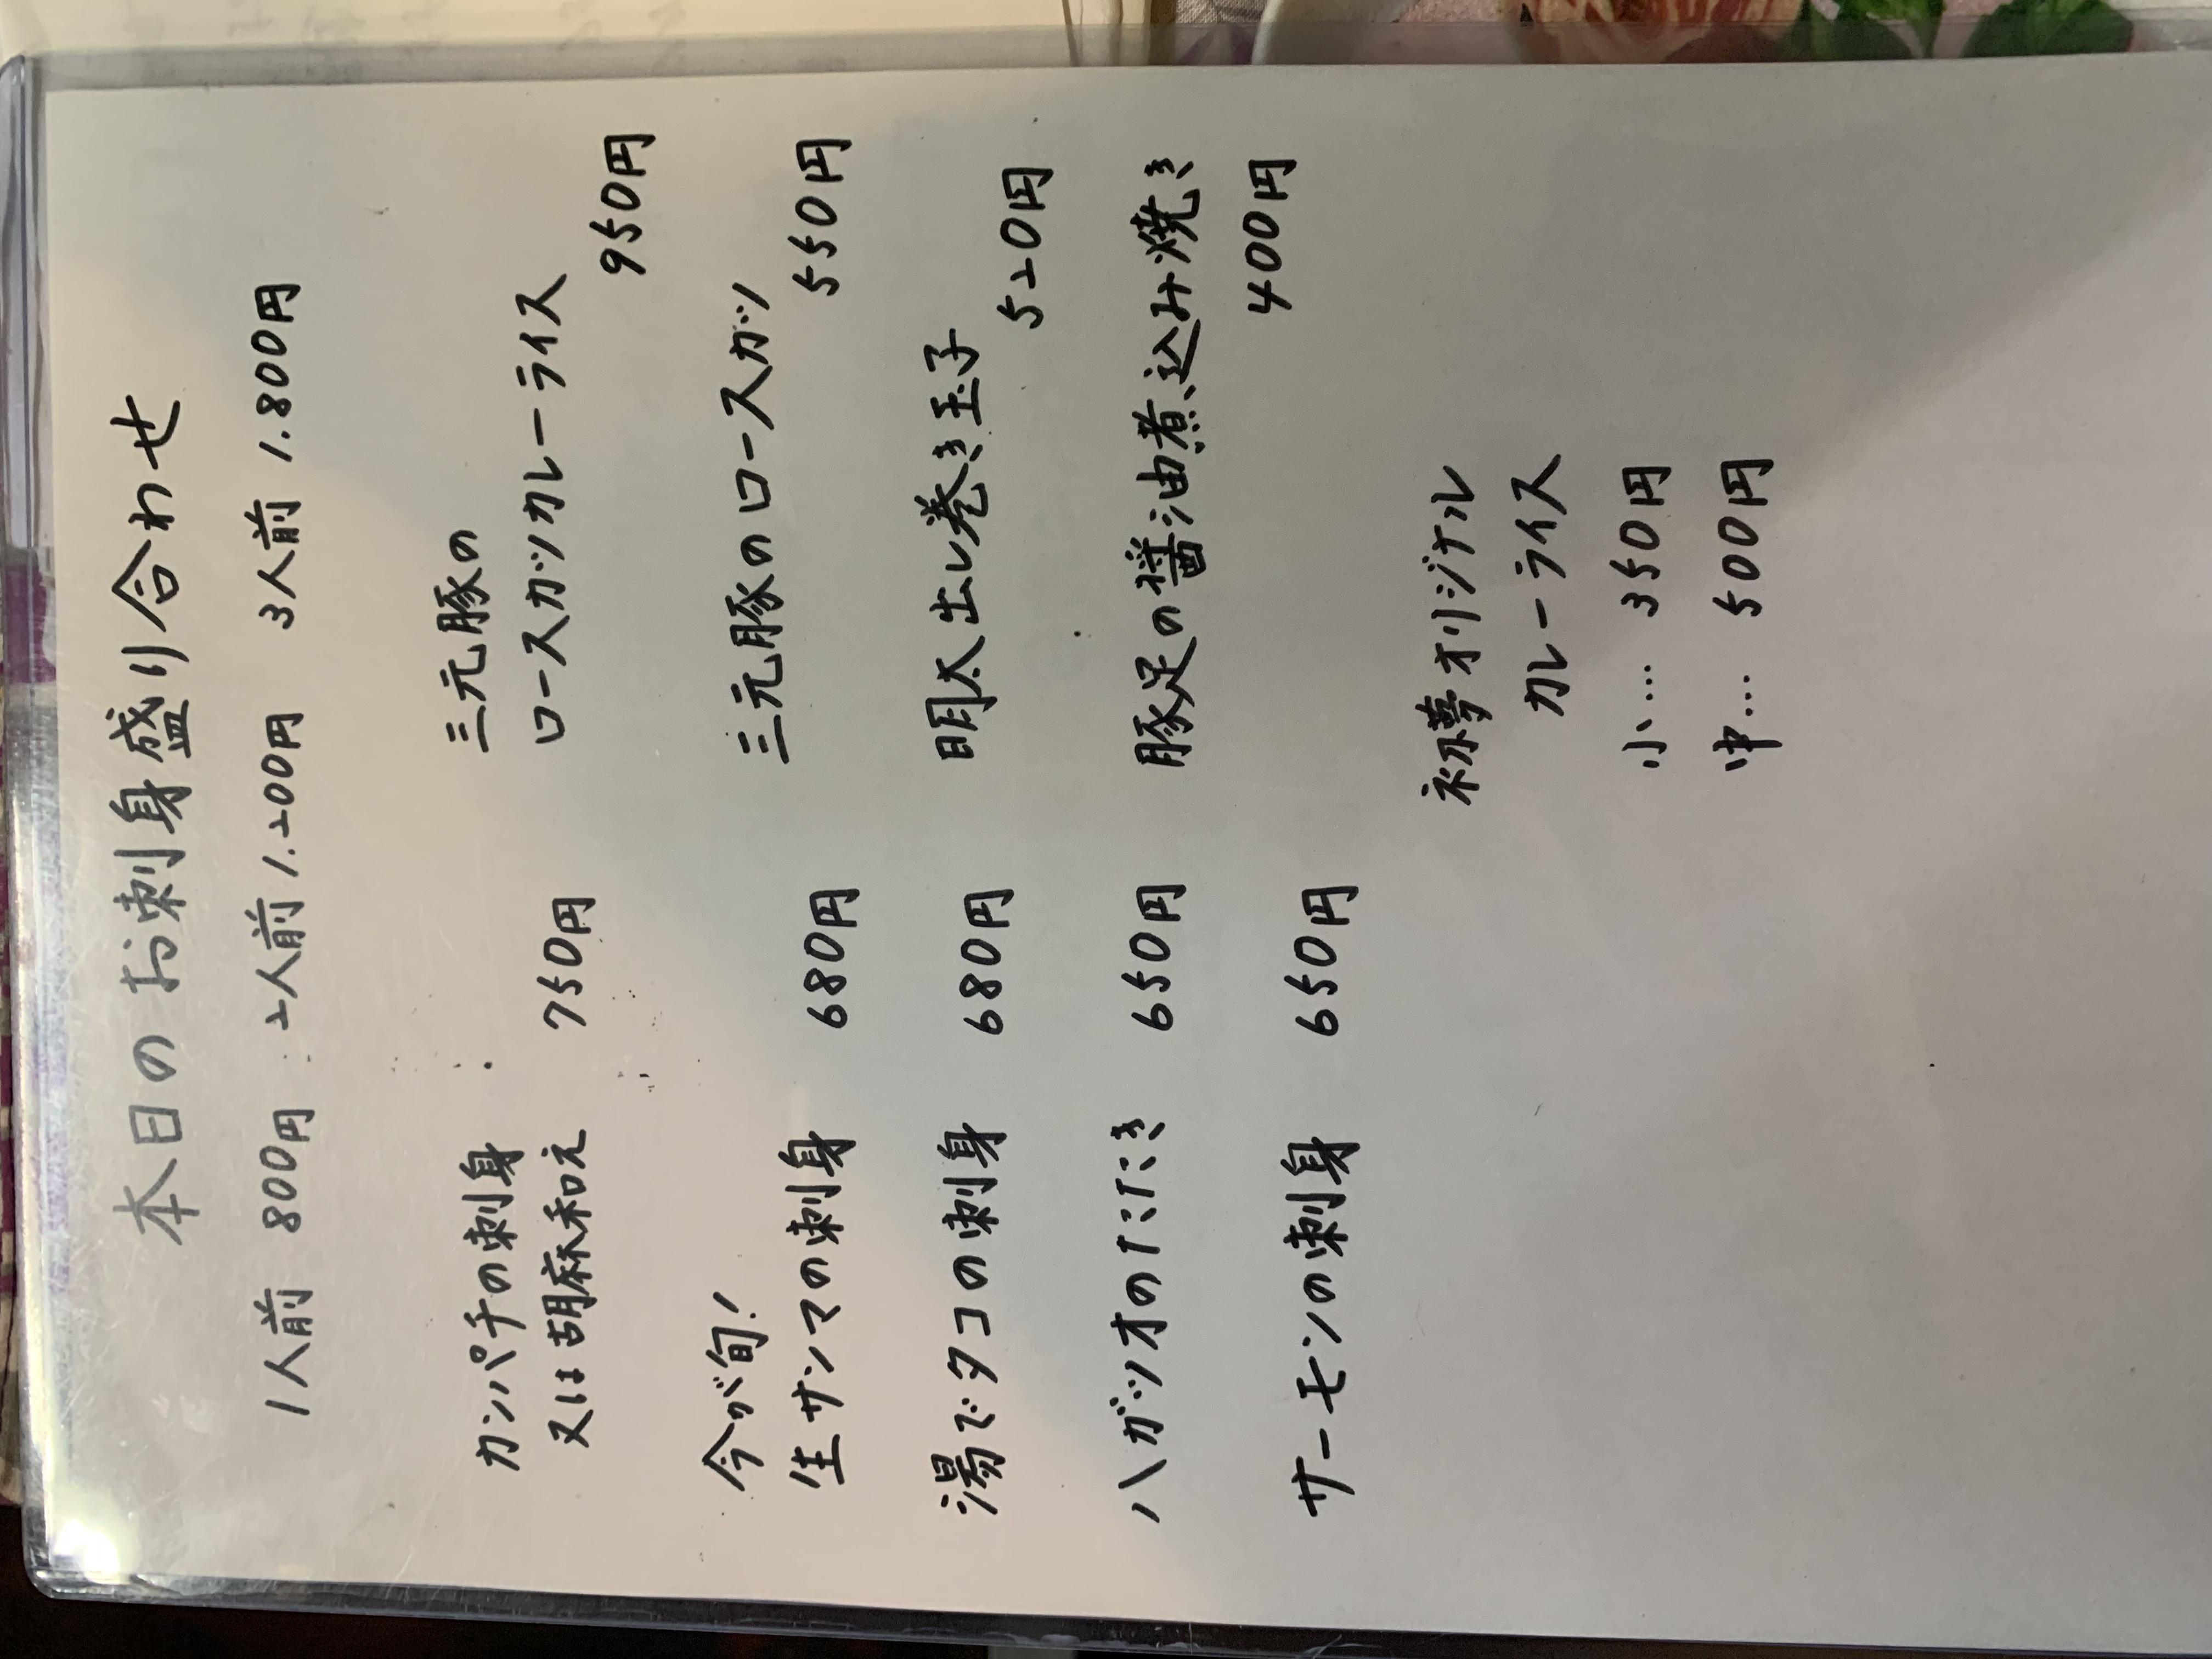 C2D90C66-8A8E-4FE7-89A1-A119321ABC68